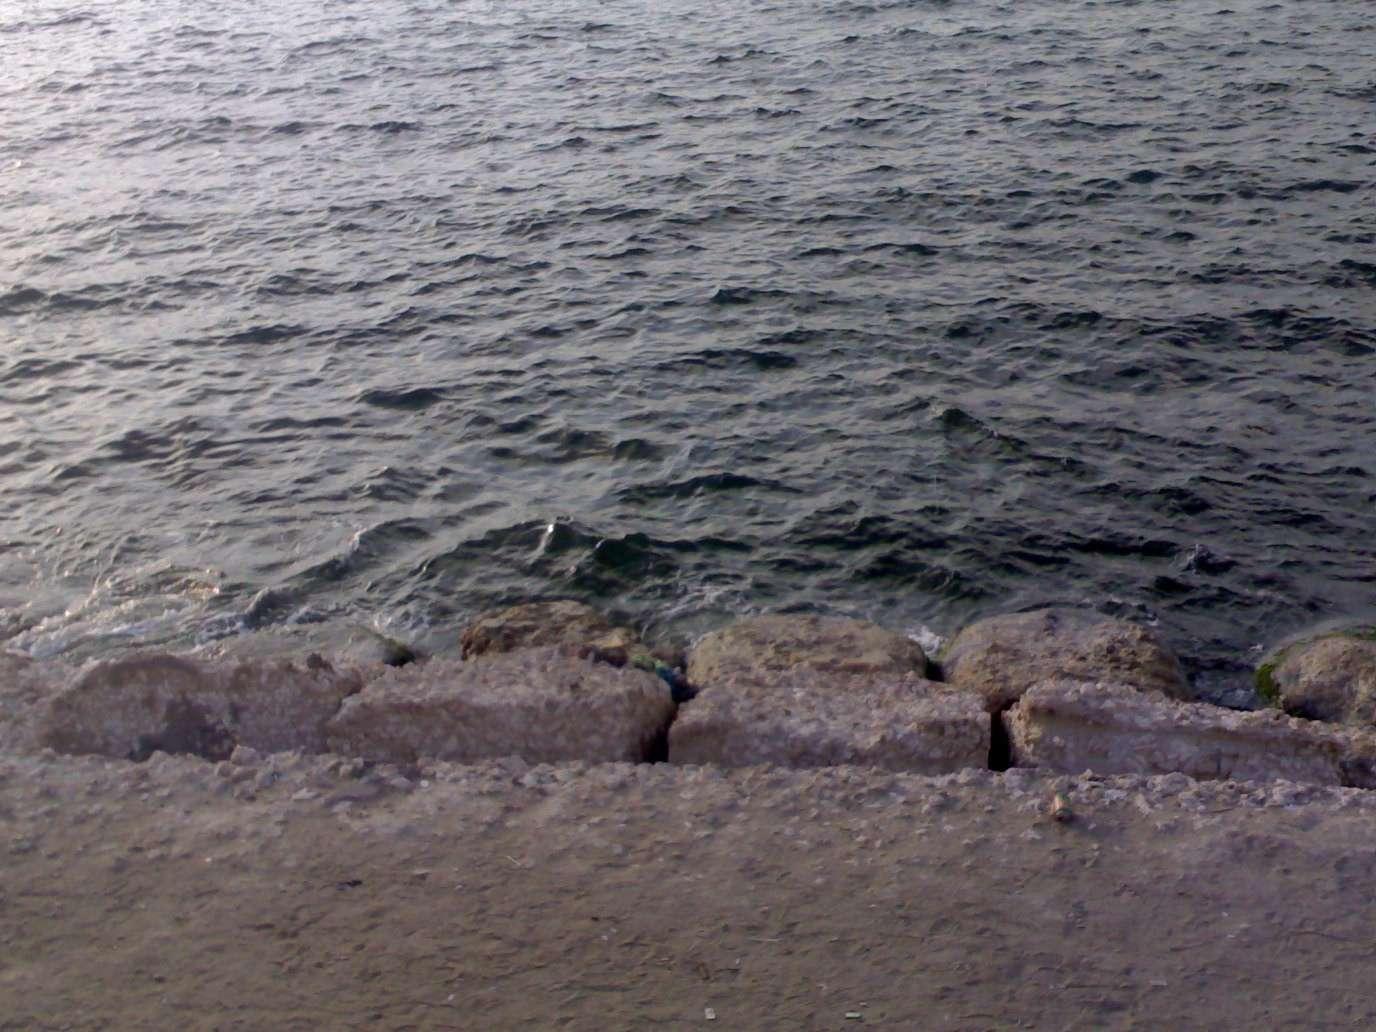 صووور شواااطئ اسكندررية 20081012